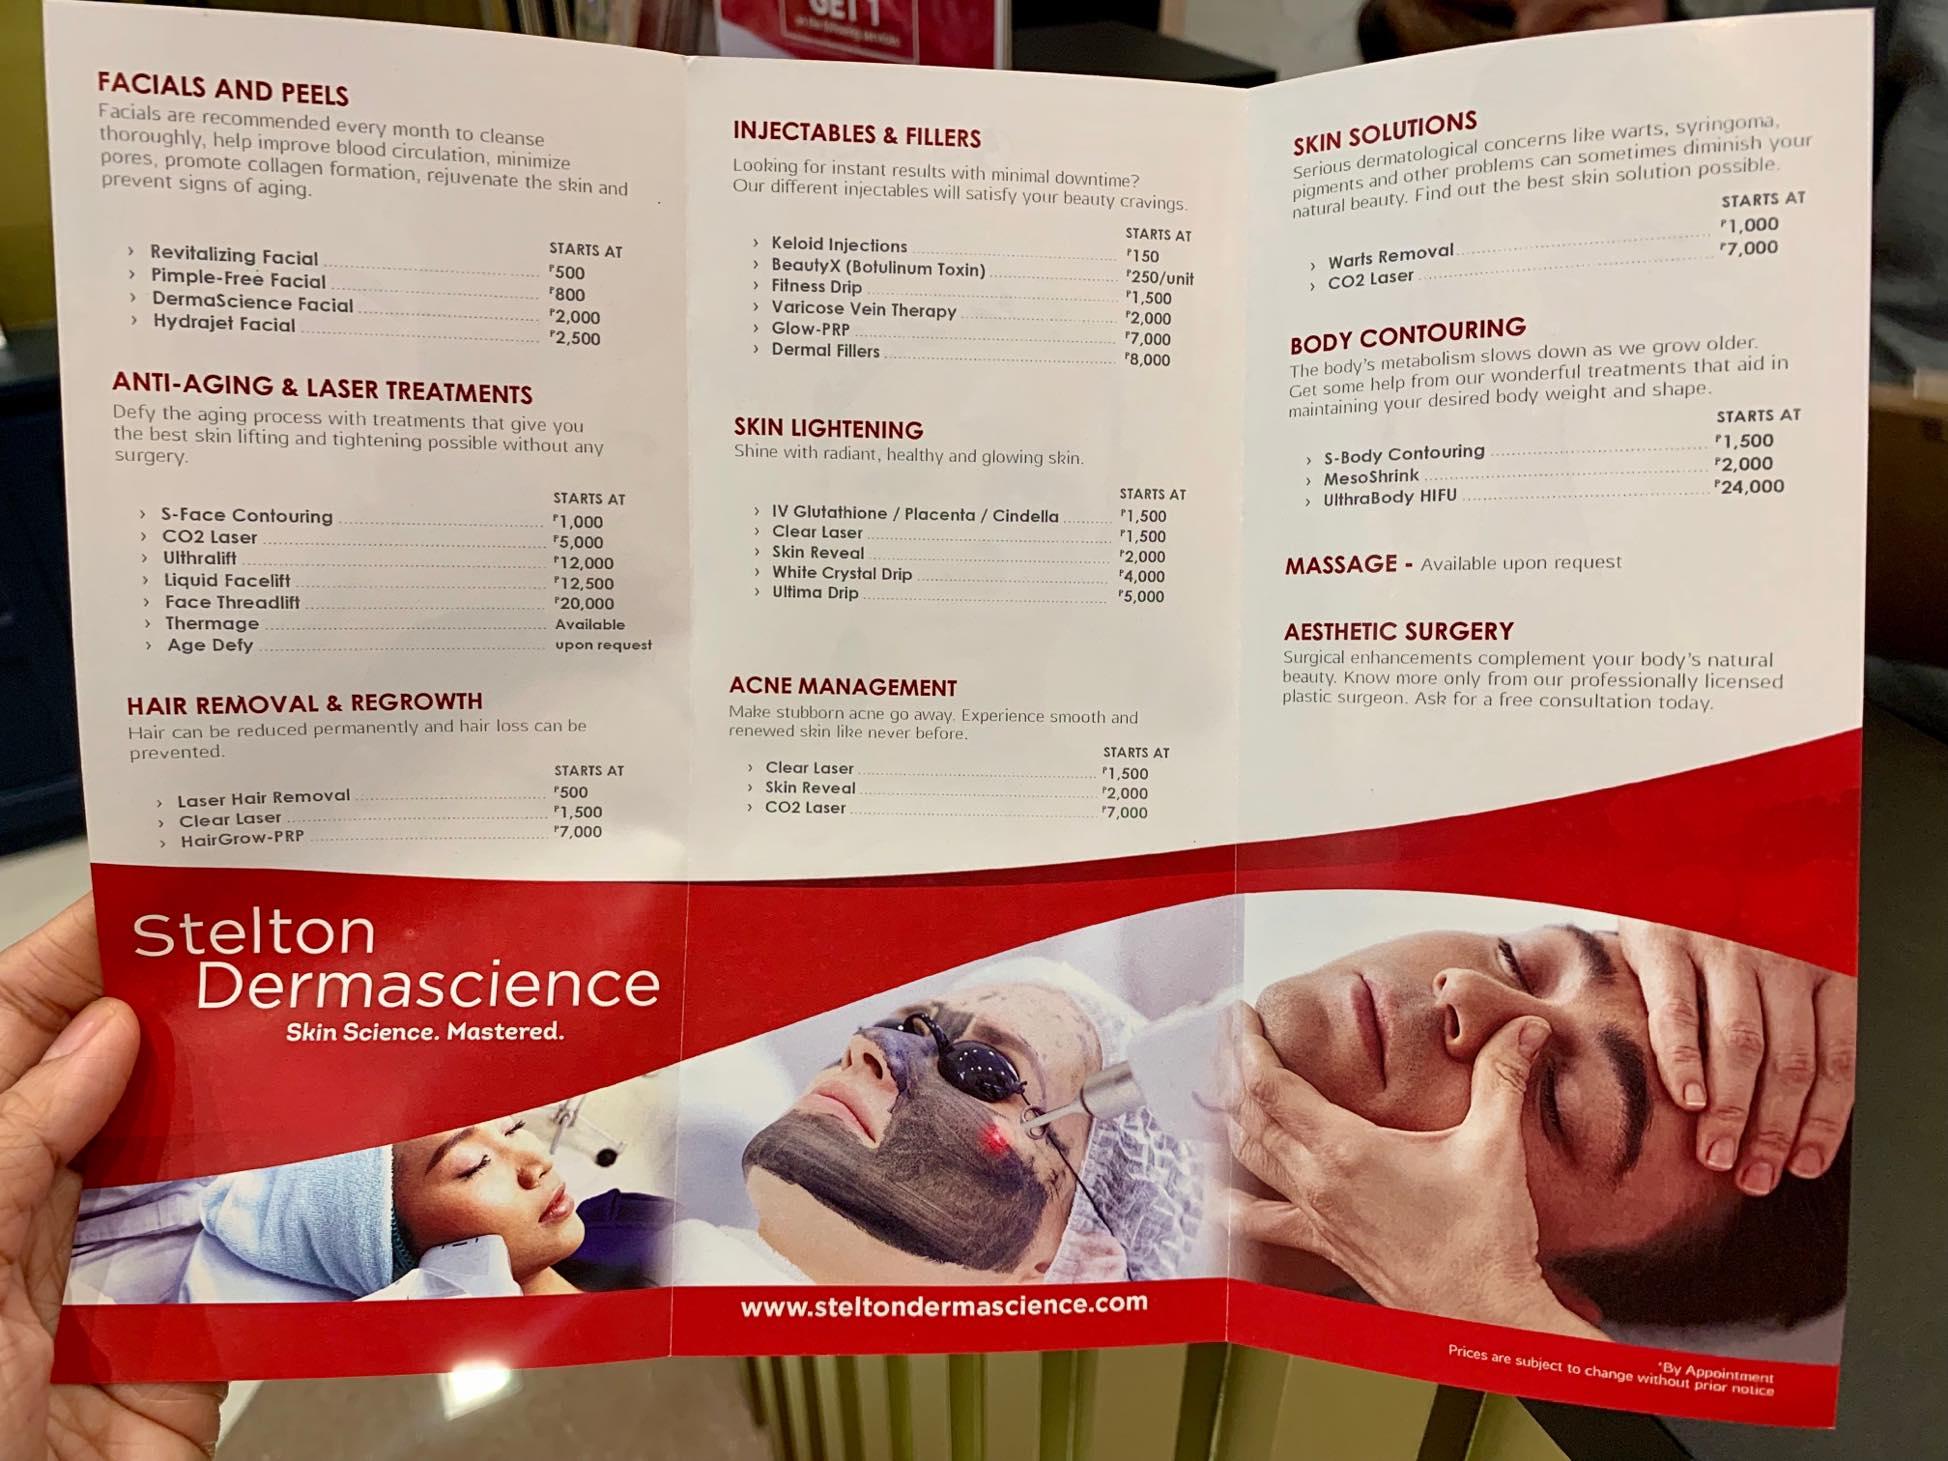 Stelton Dermoscience promo